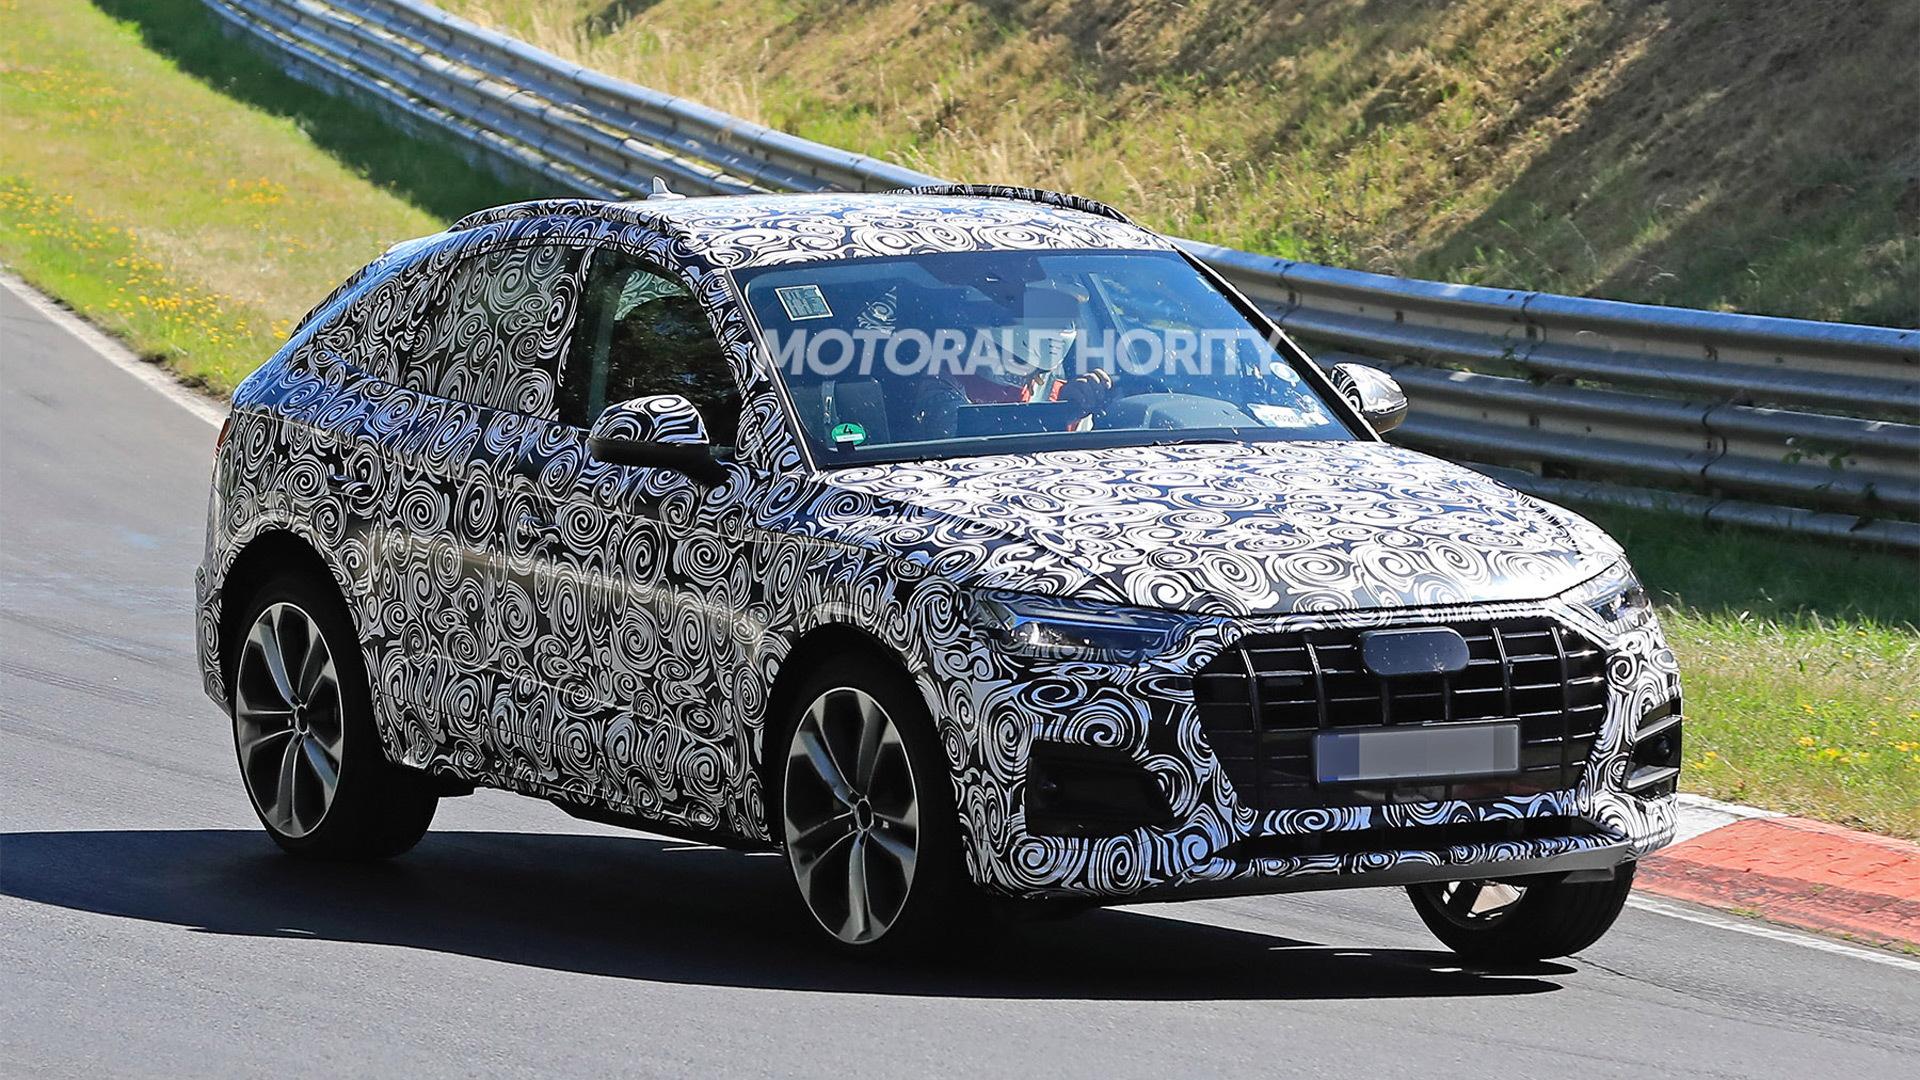 2021 Audi Q5 Sportback spy shots - Picture credit:S. Baldauf/SB-Medien